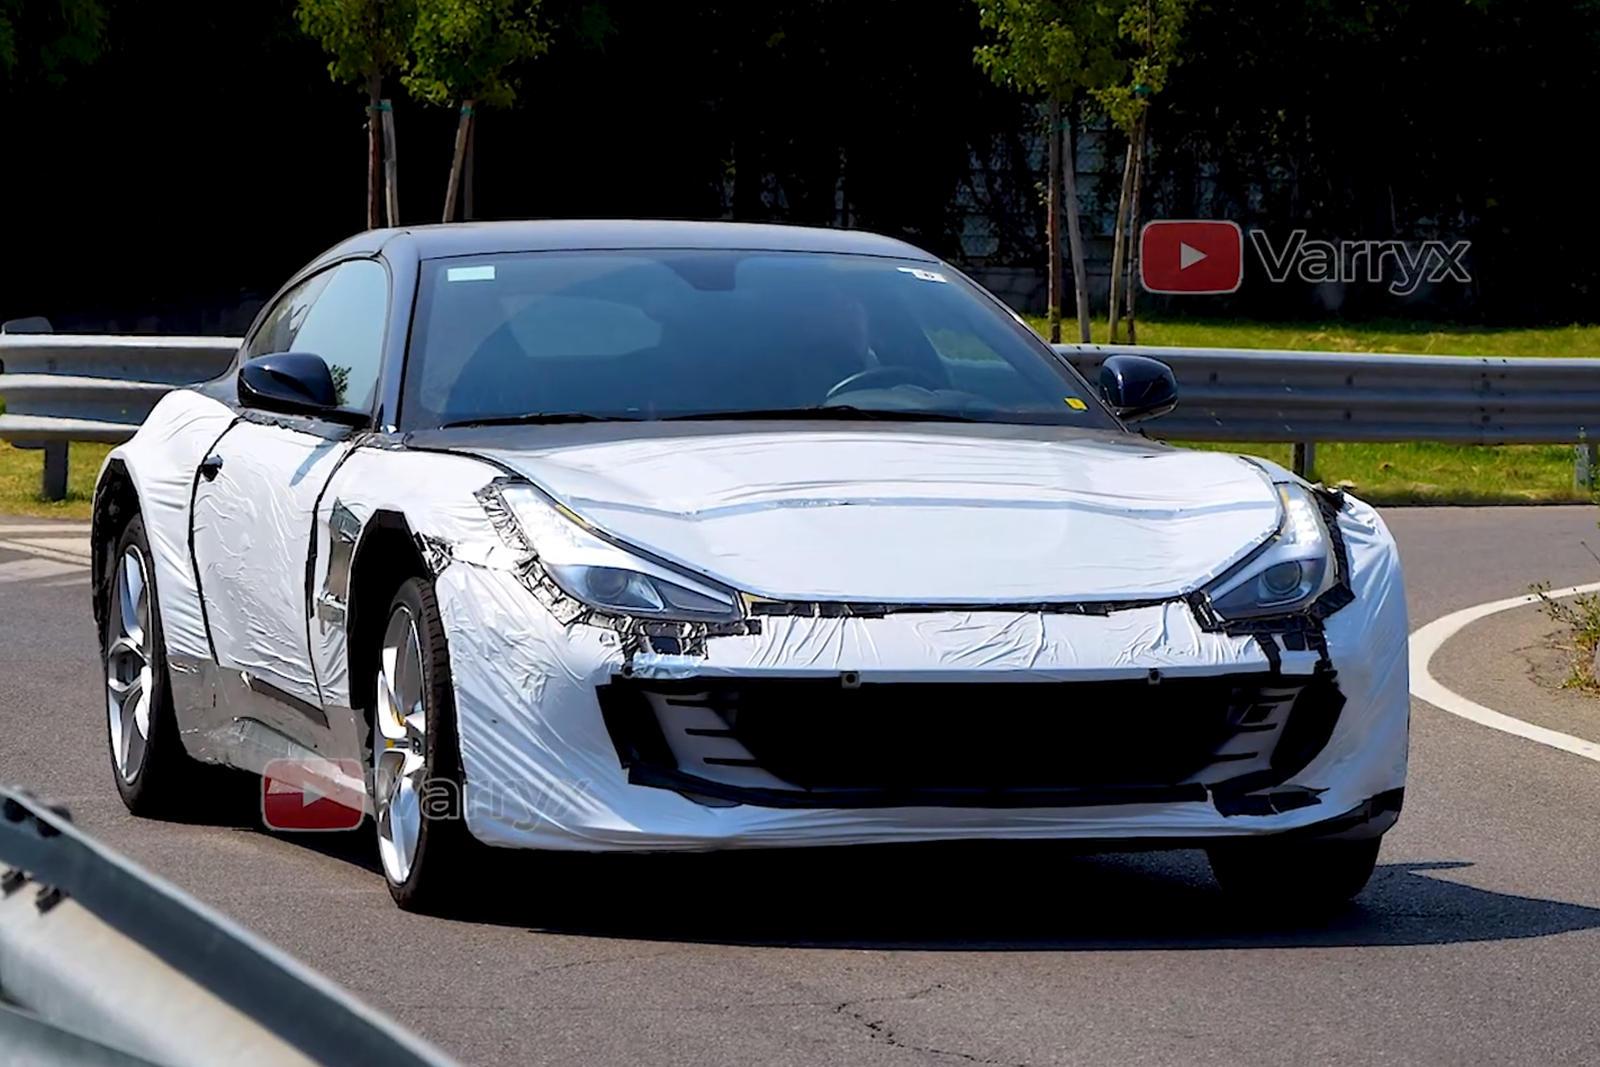 Watch Ferrari Purosangue Suv Test Mule Hits The Streets Carbuzz